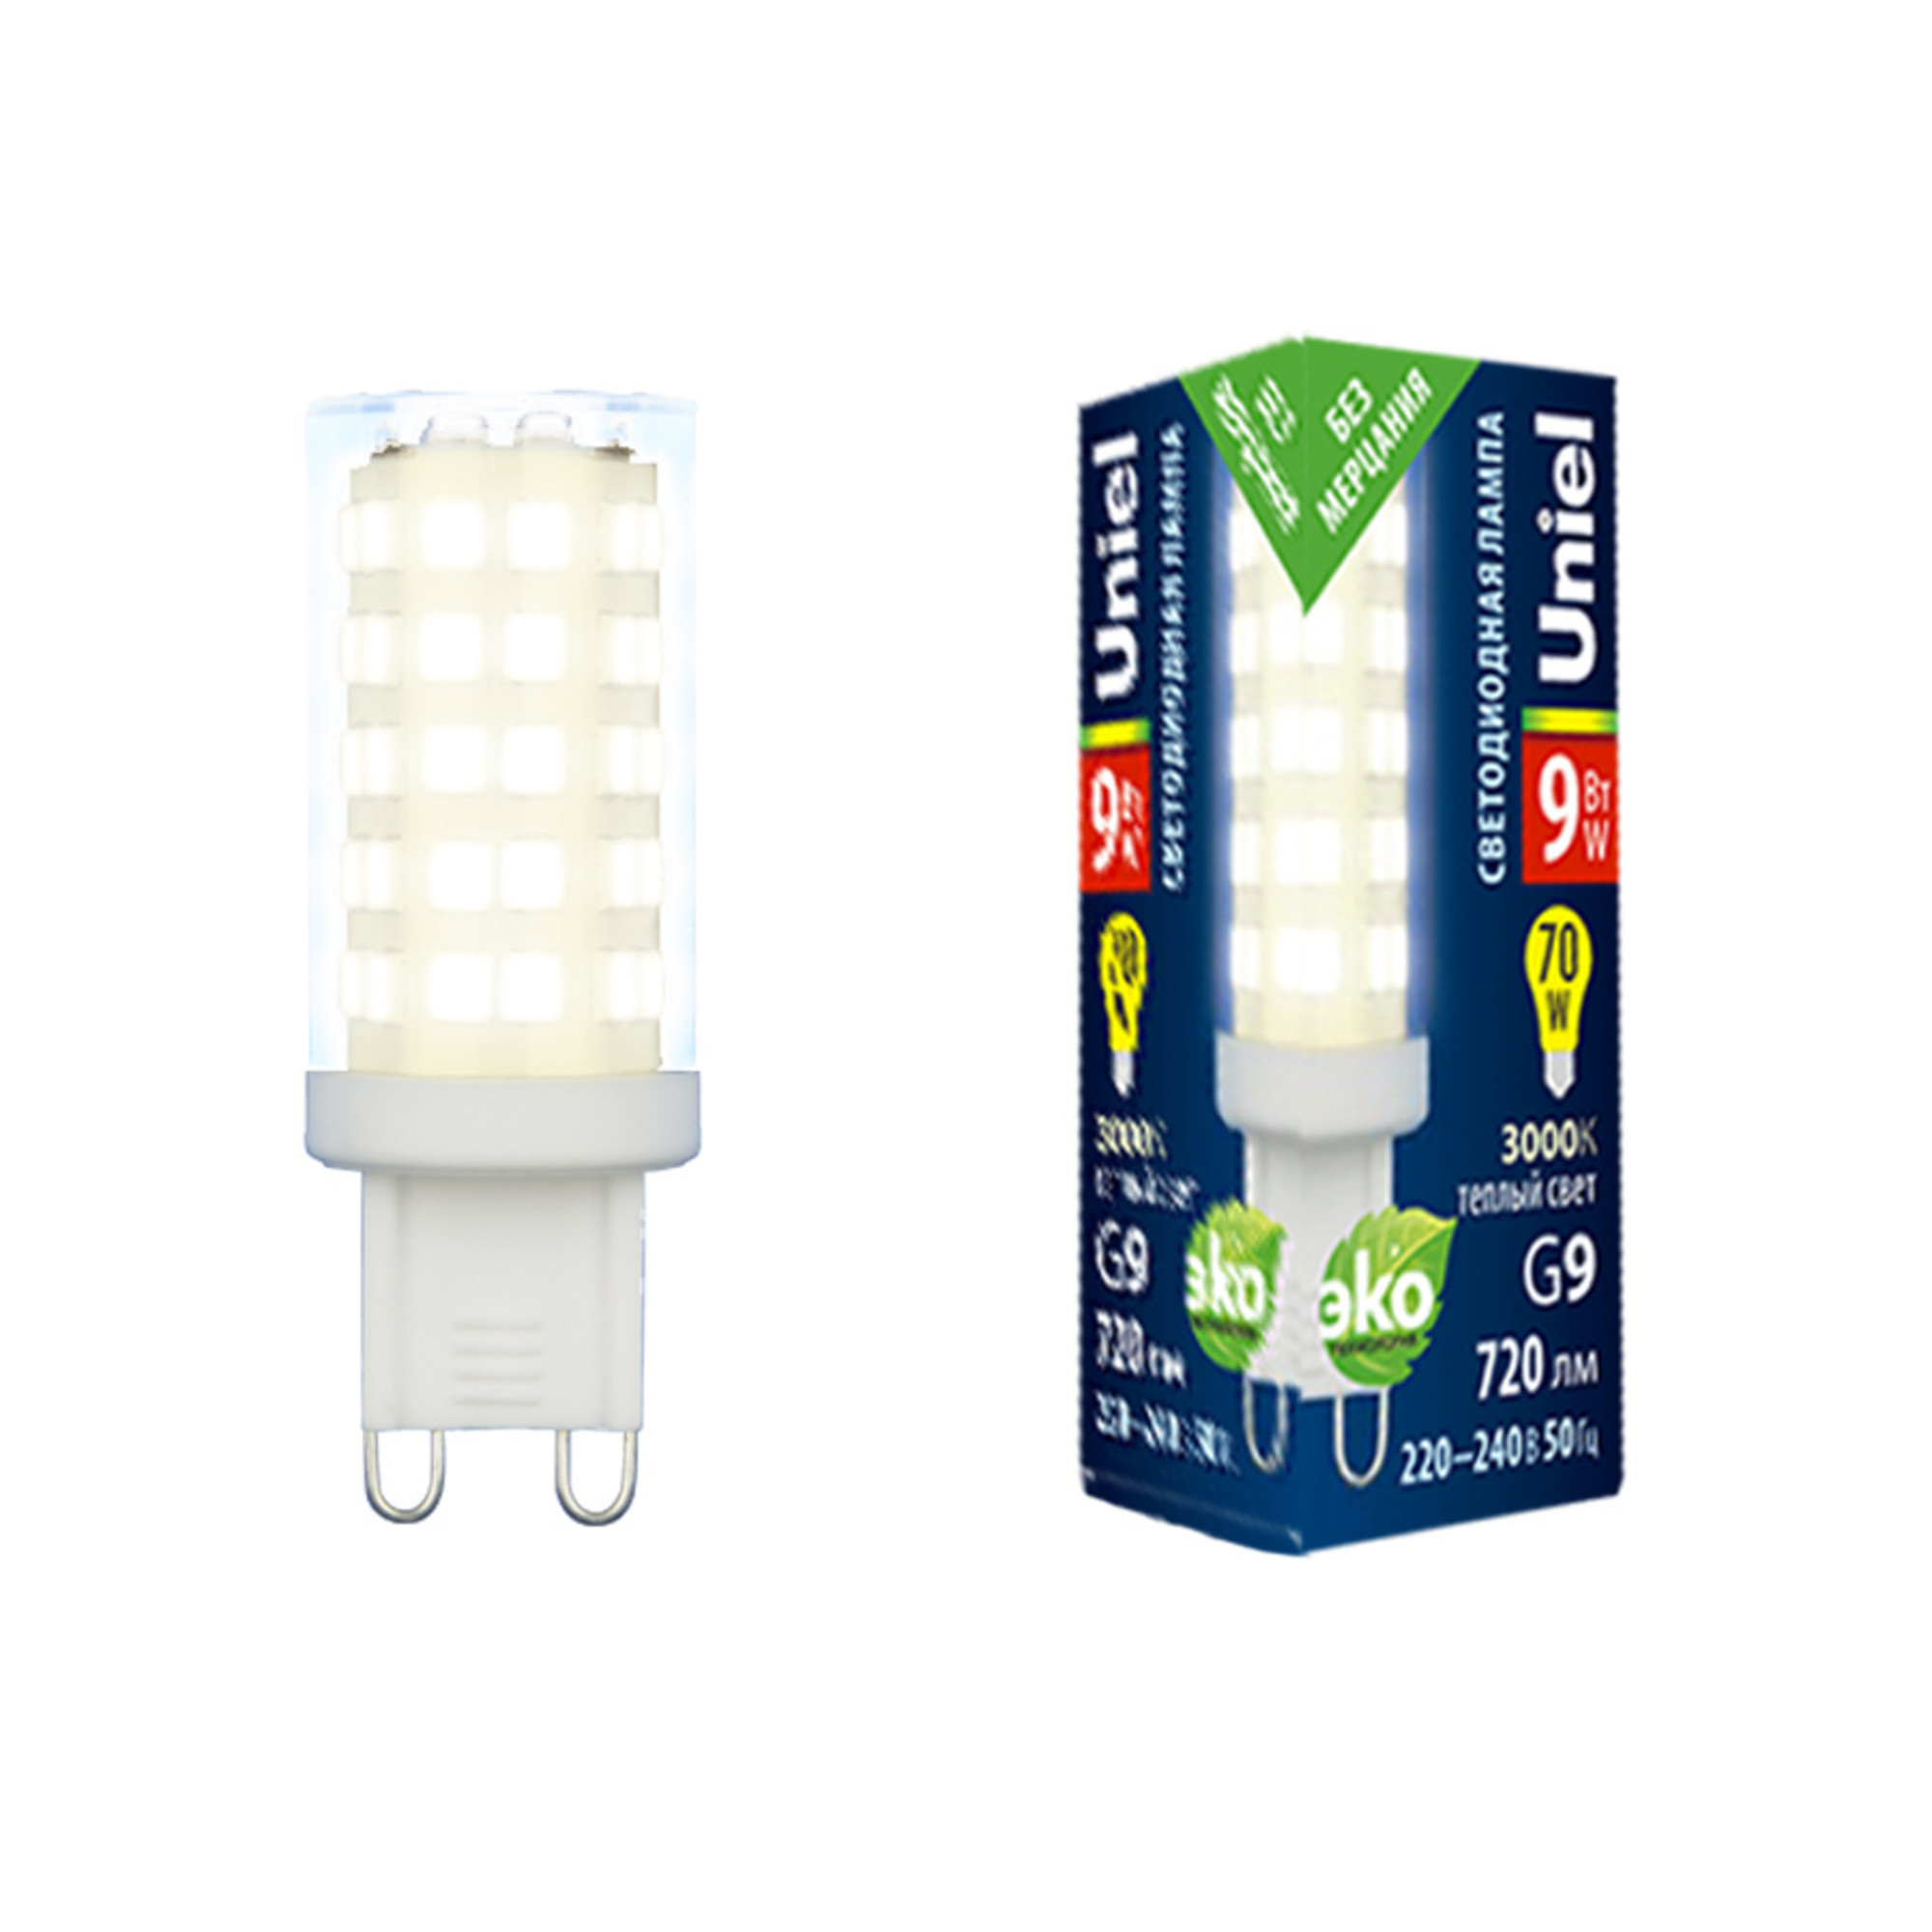 Лампа светодиодная G9 9 Вт капсула прозрачная 720 лм тёплый белый свет